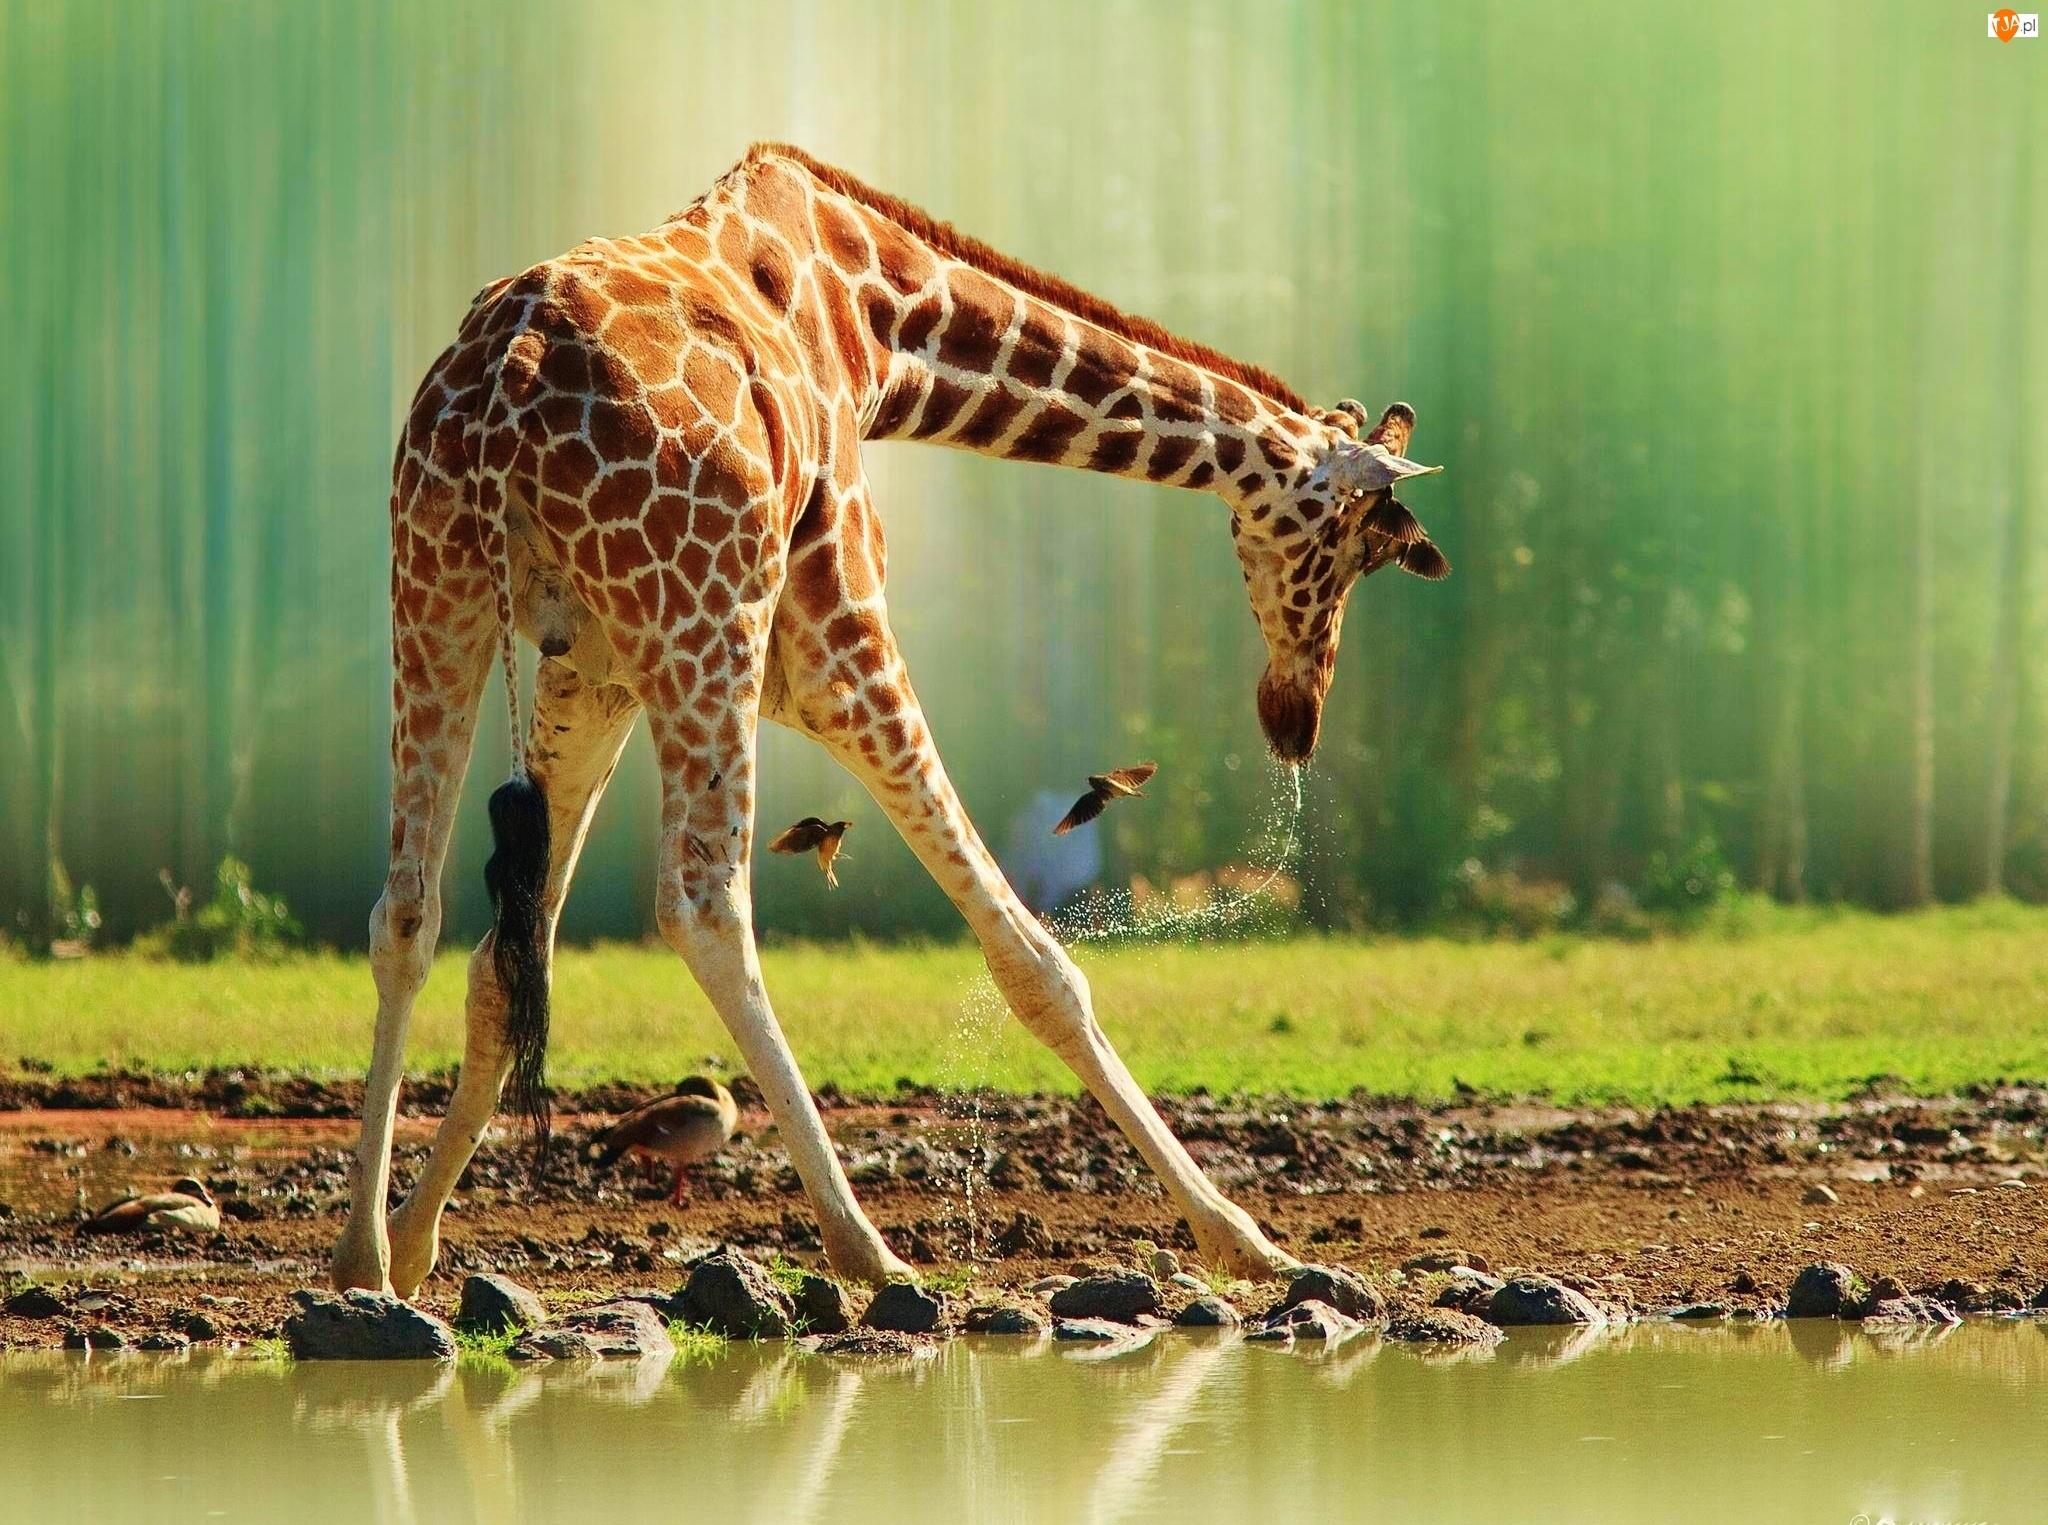 Котики картинки, картинка с жирафом в воде